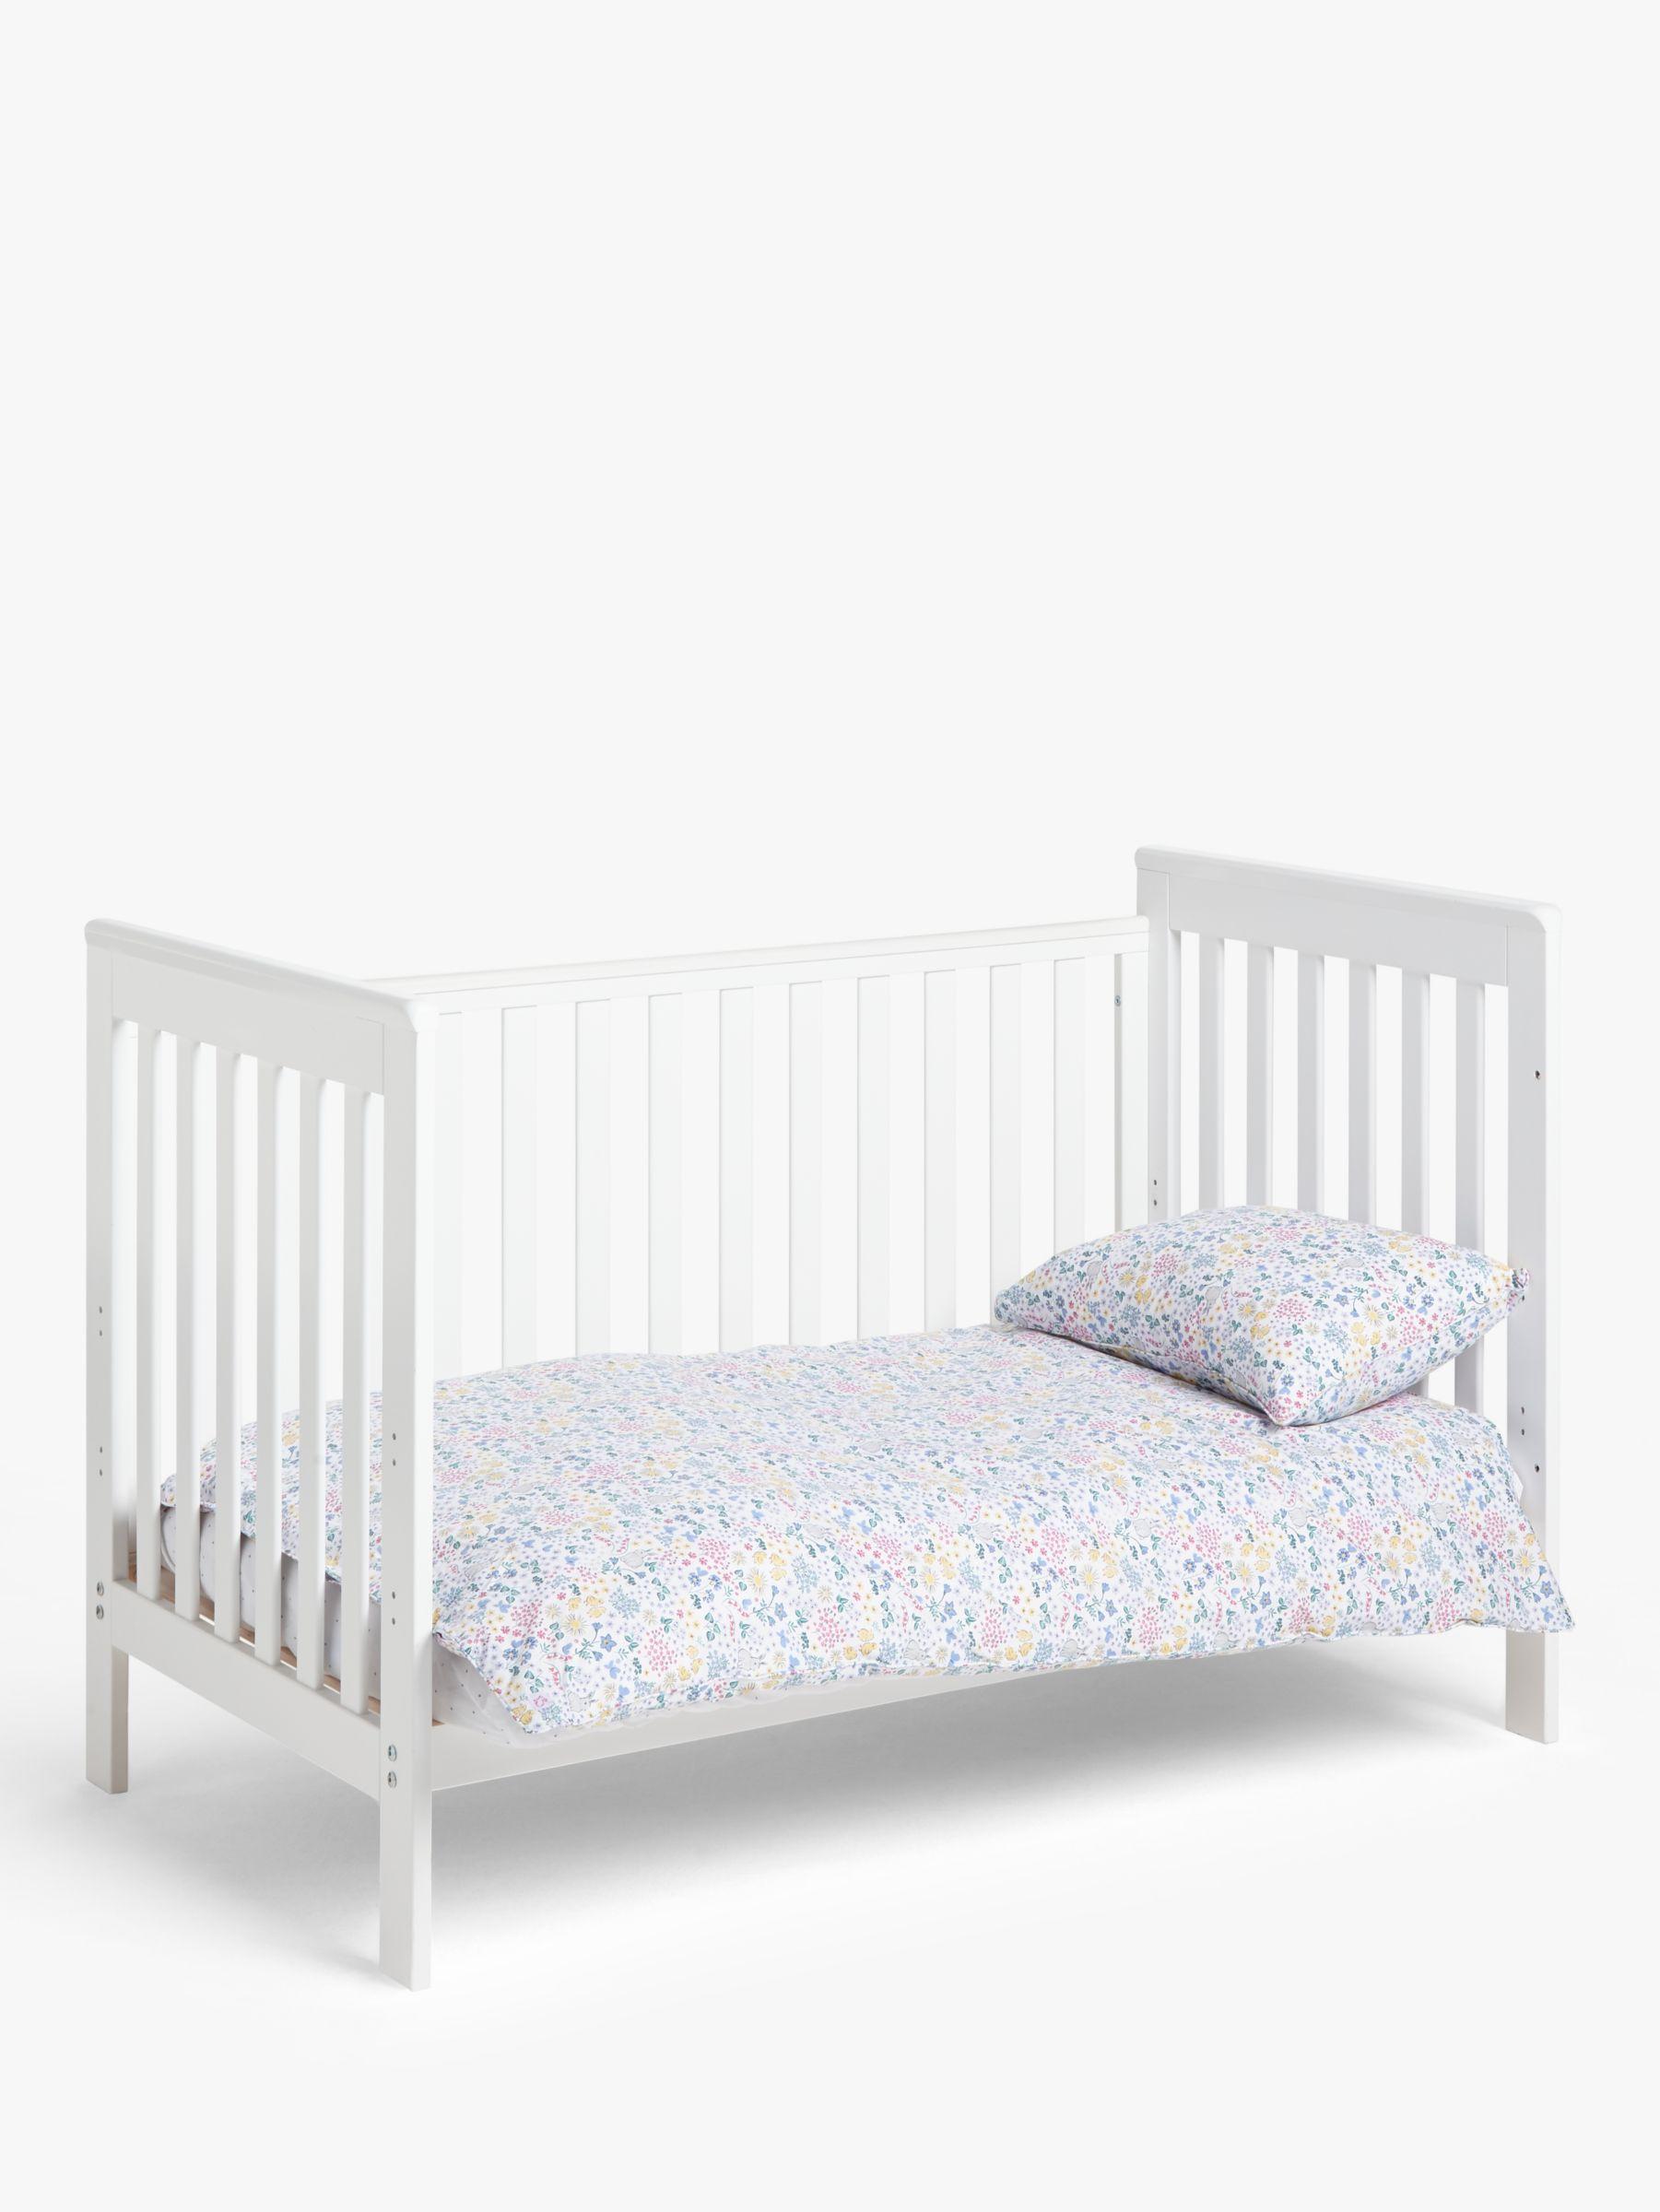 Beautiful pink grey bunny nursery cot bed bumper wrap duvet pillowcase set